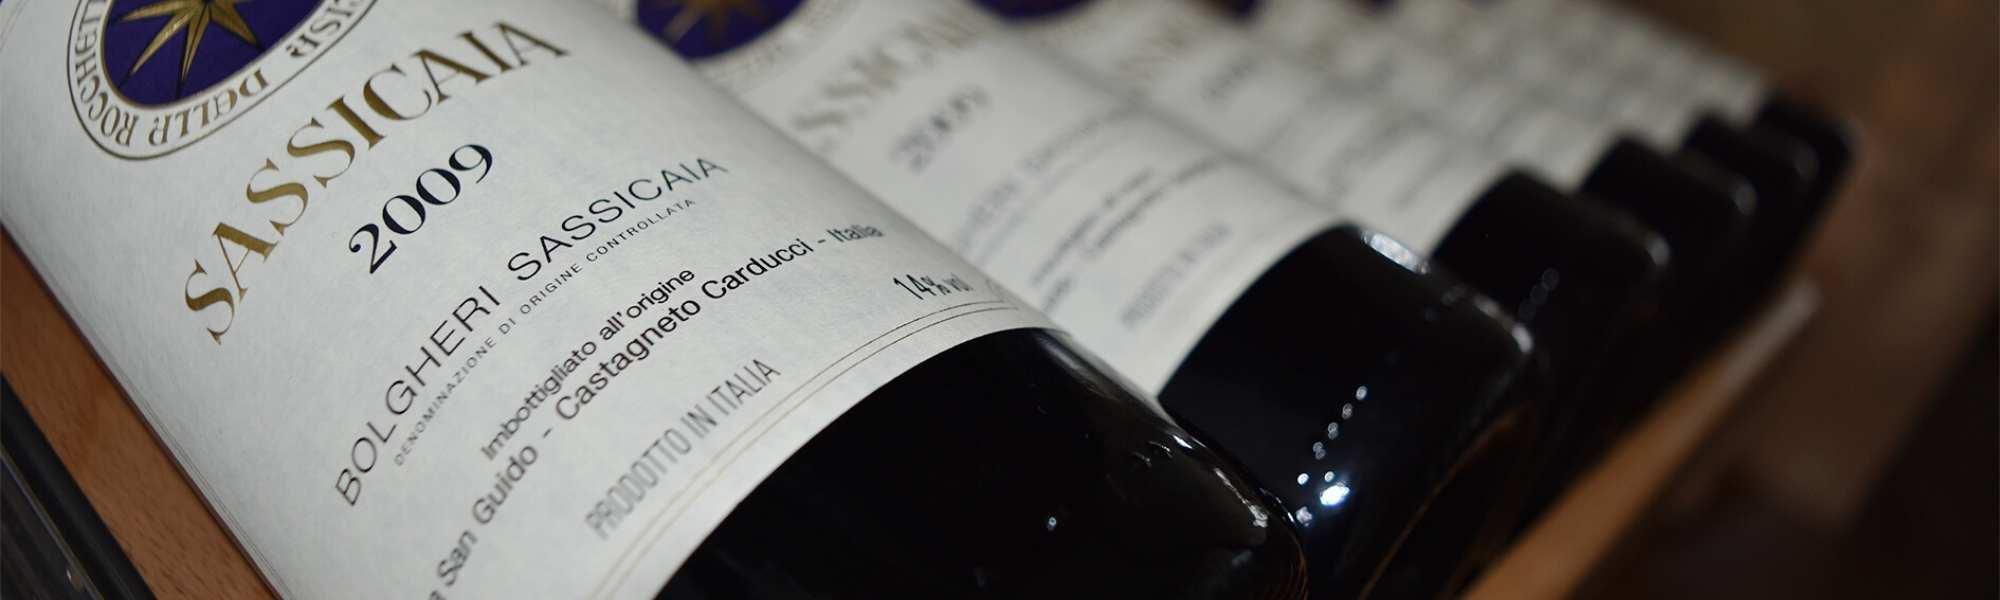 vino sassicaia Bolgheri 2009